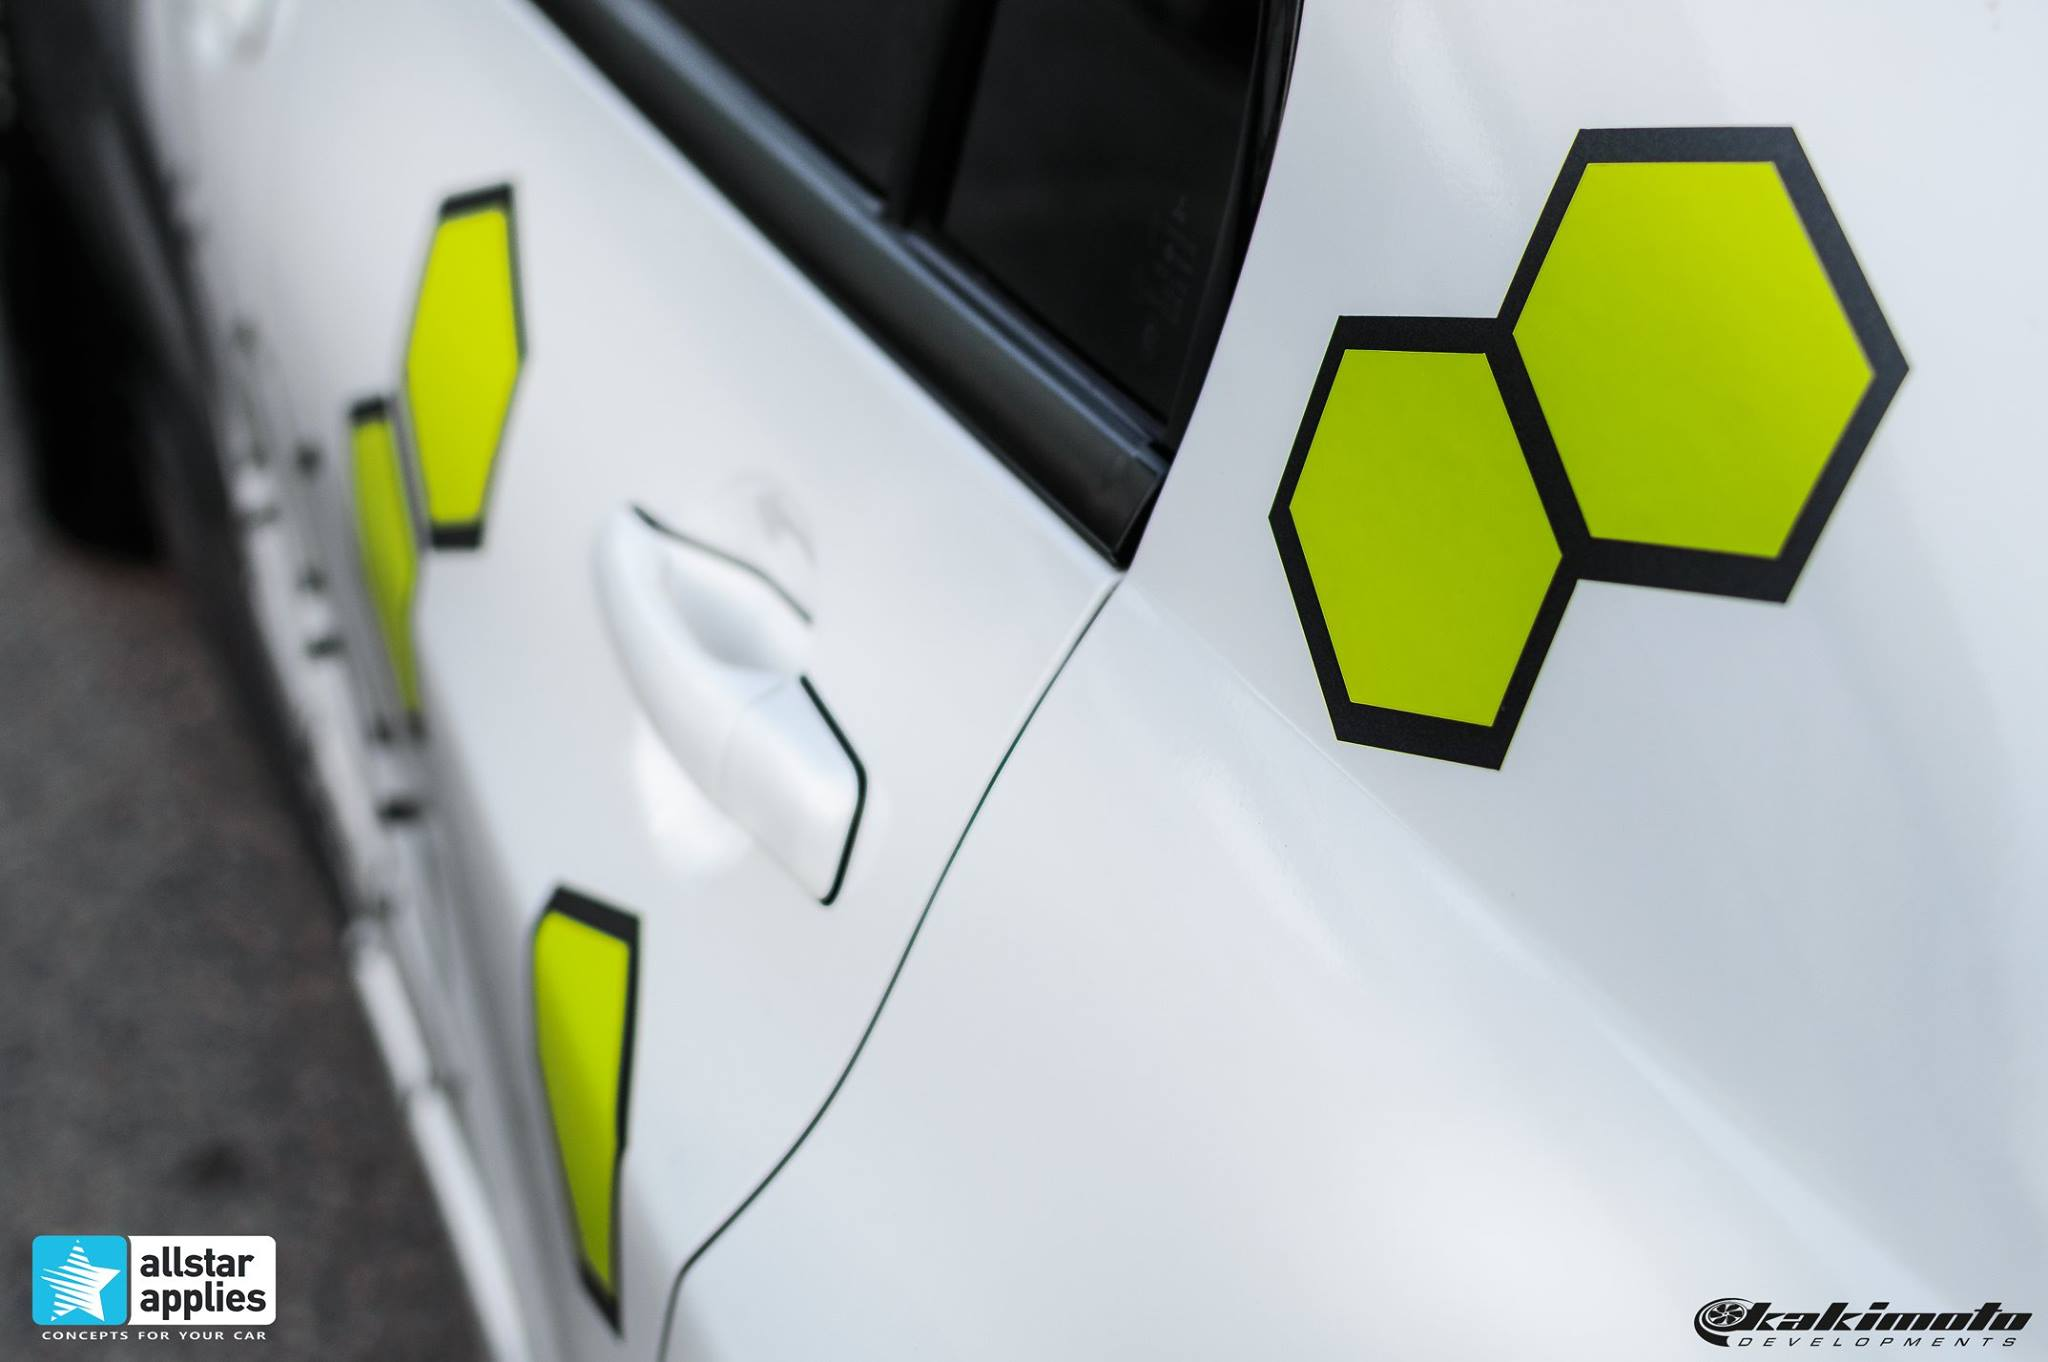 Mitsubishi Evo 7 - Honeycomb Design (14)